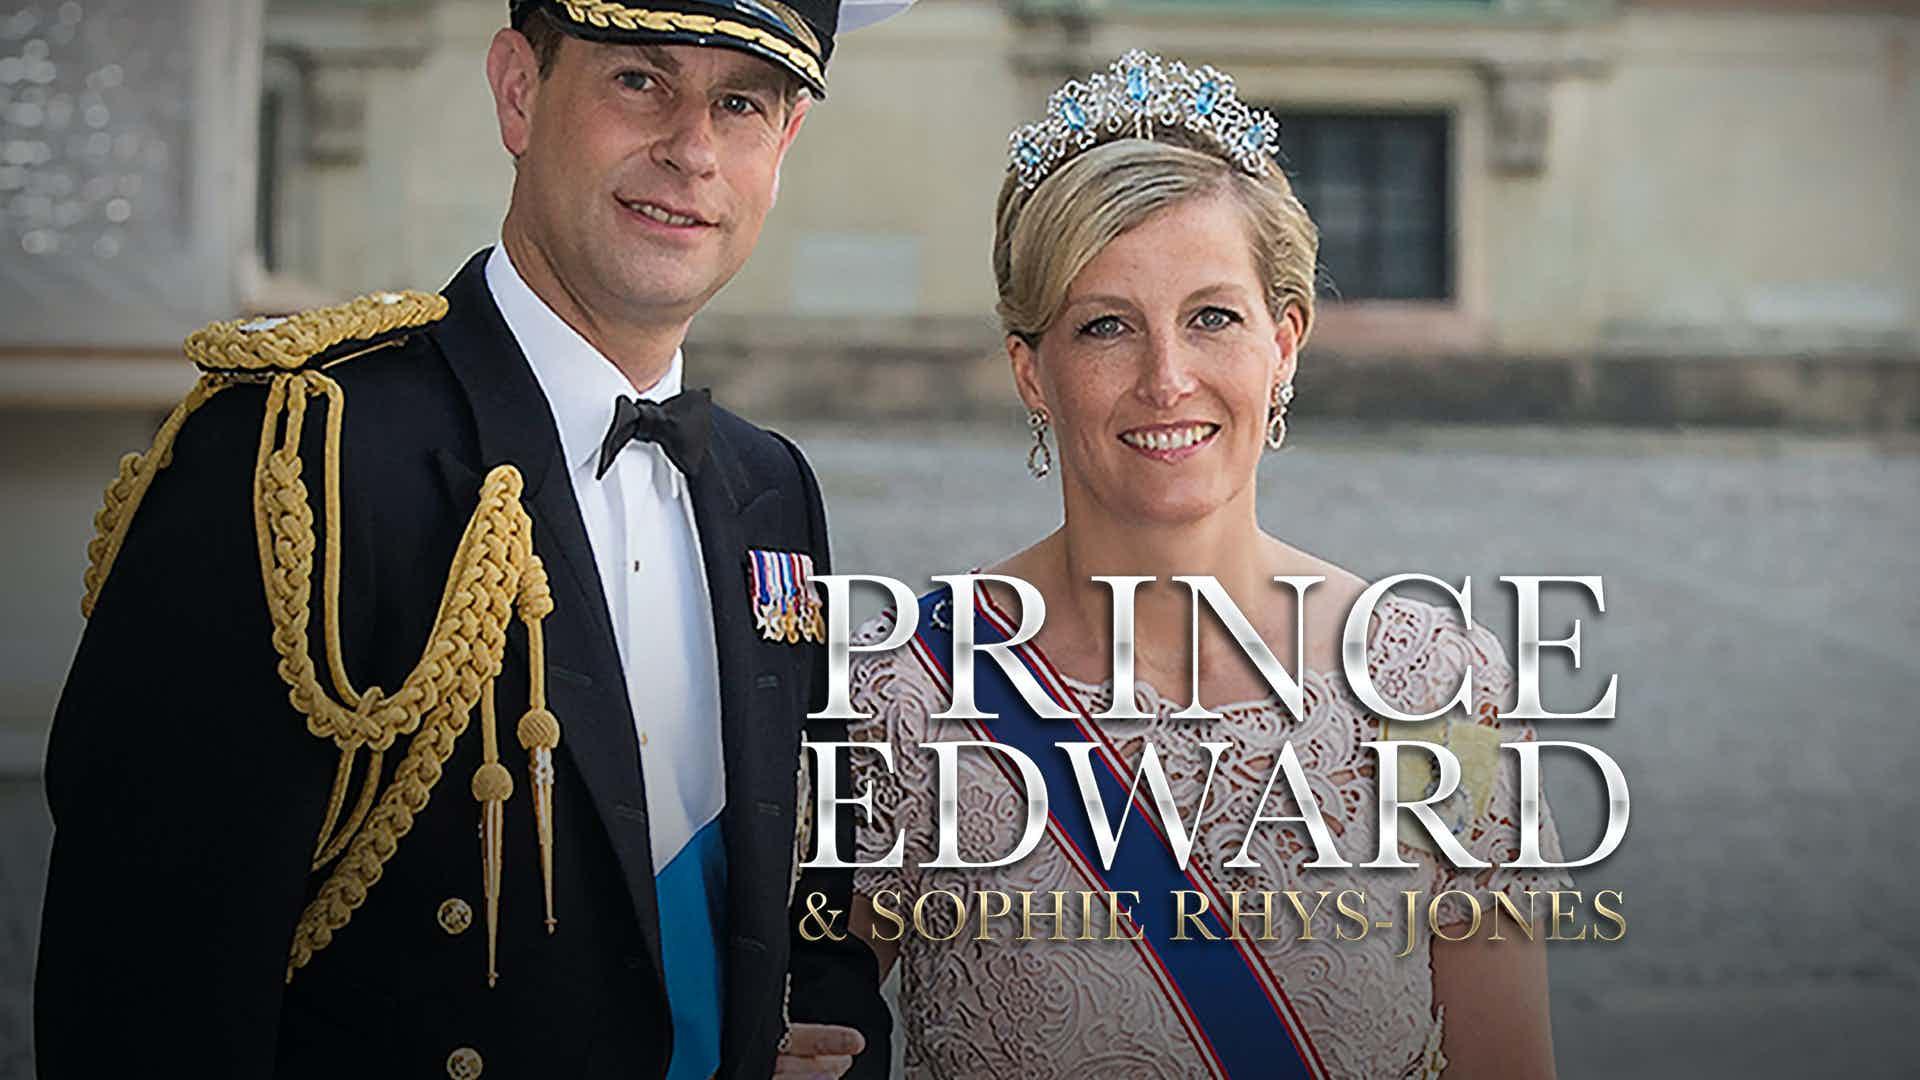 Prince Edward and Sophie Rhys-Jones